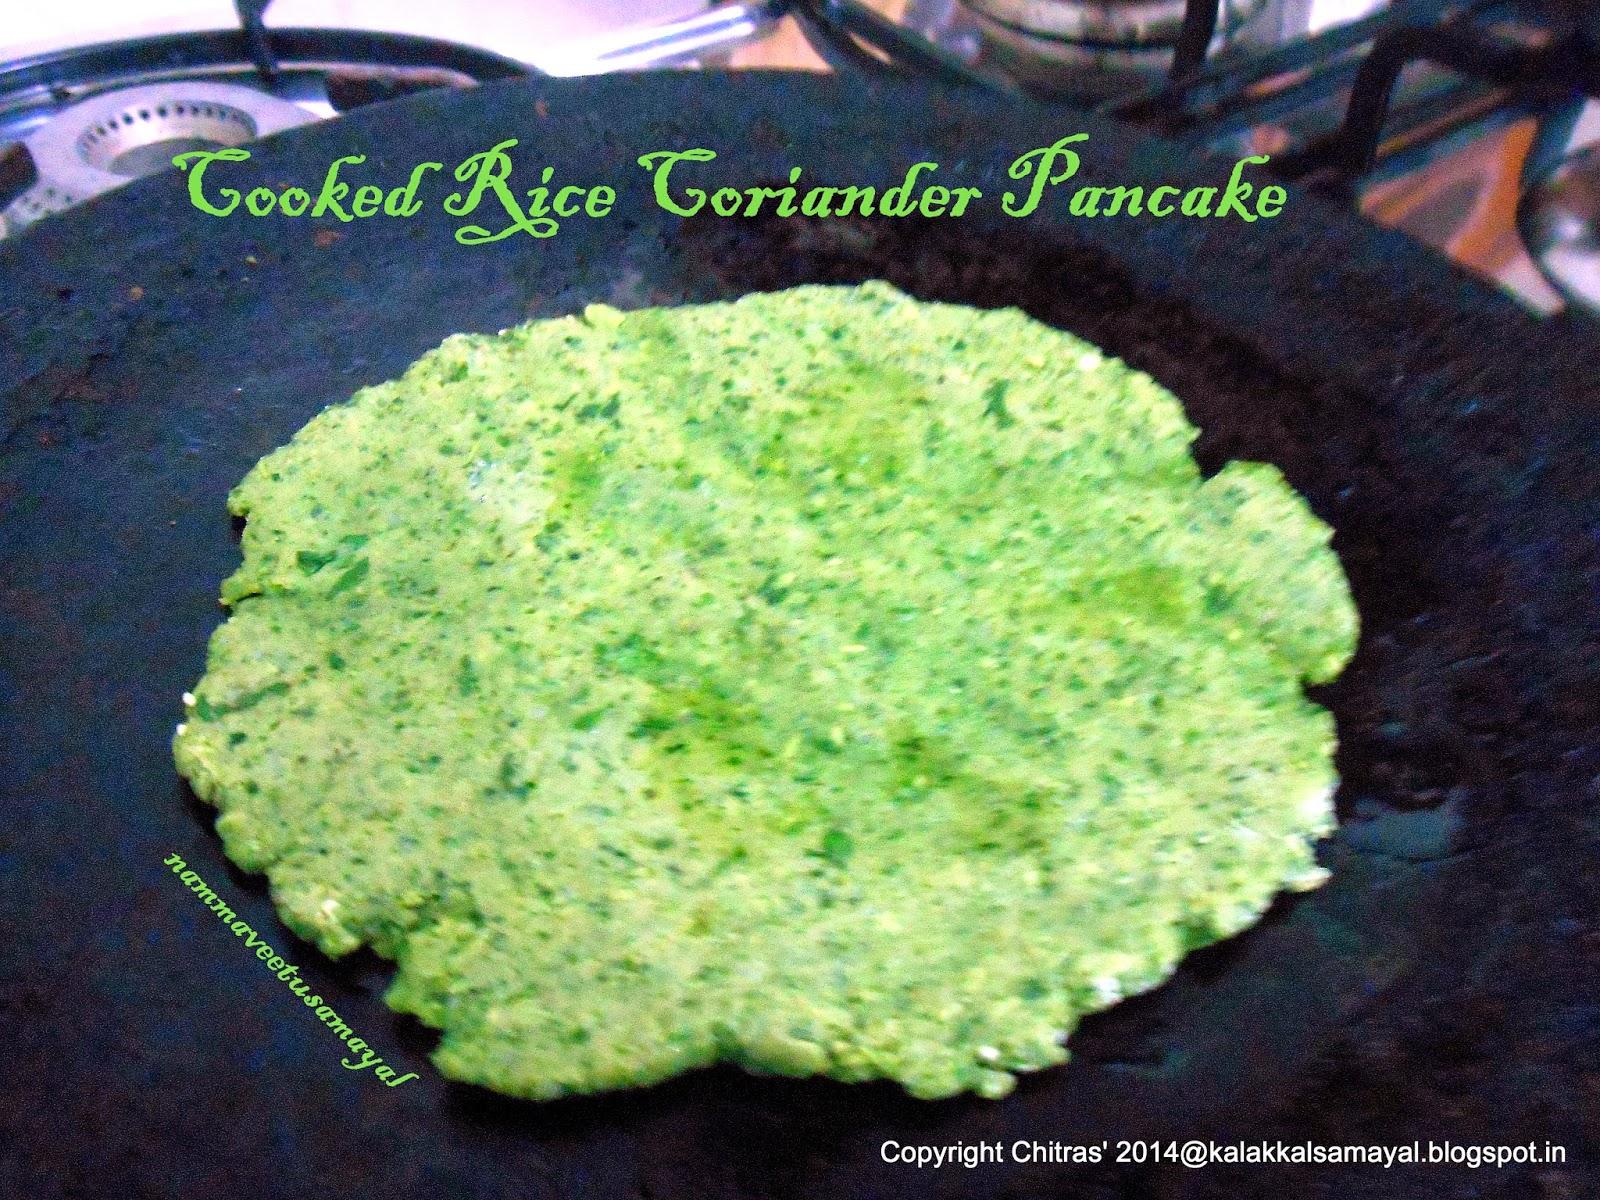 Cooked Rice Coriander Pancake